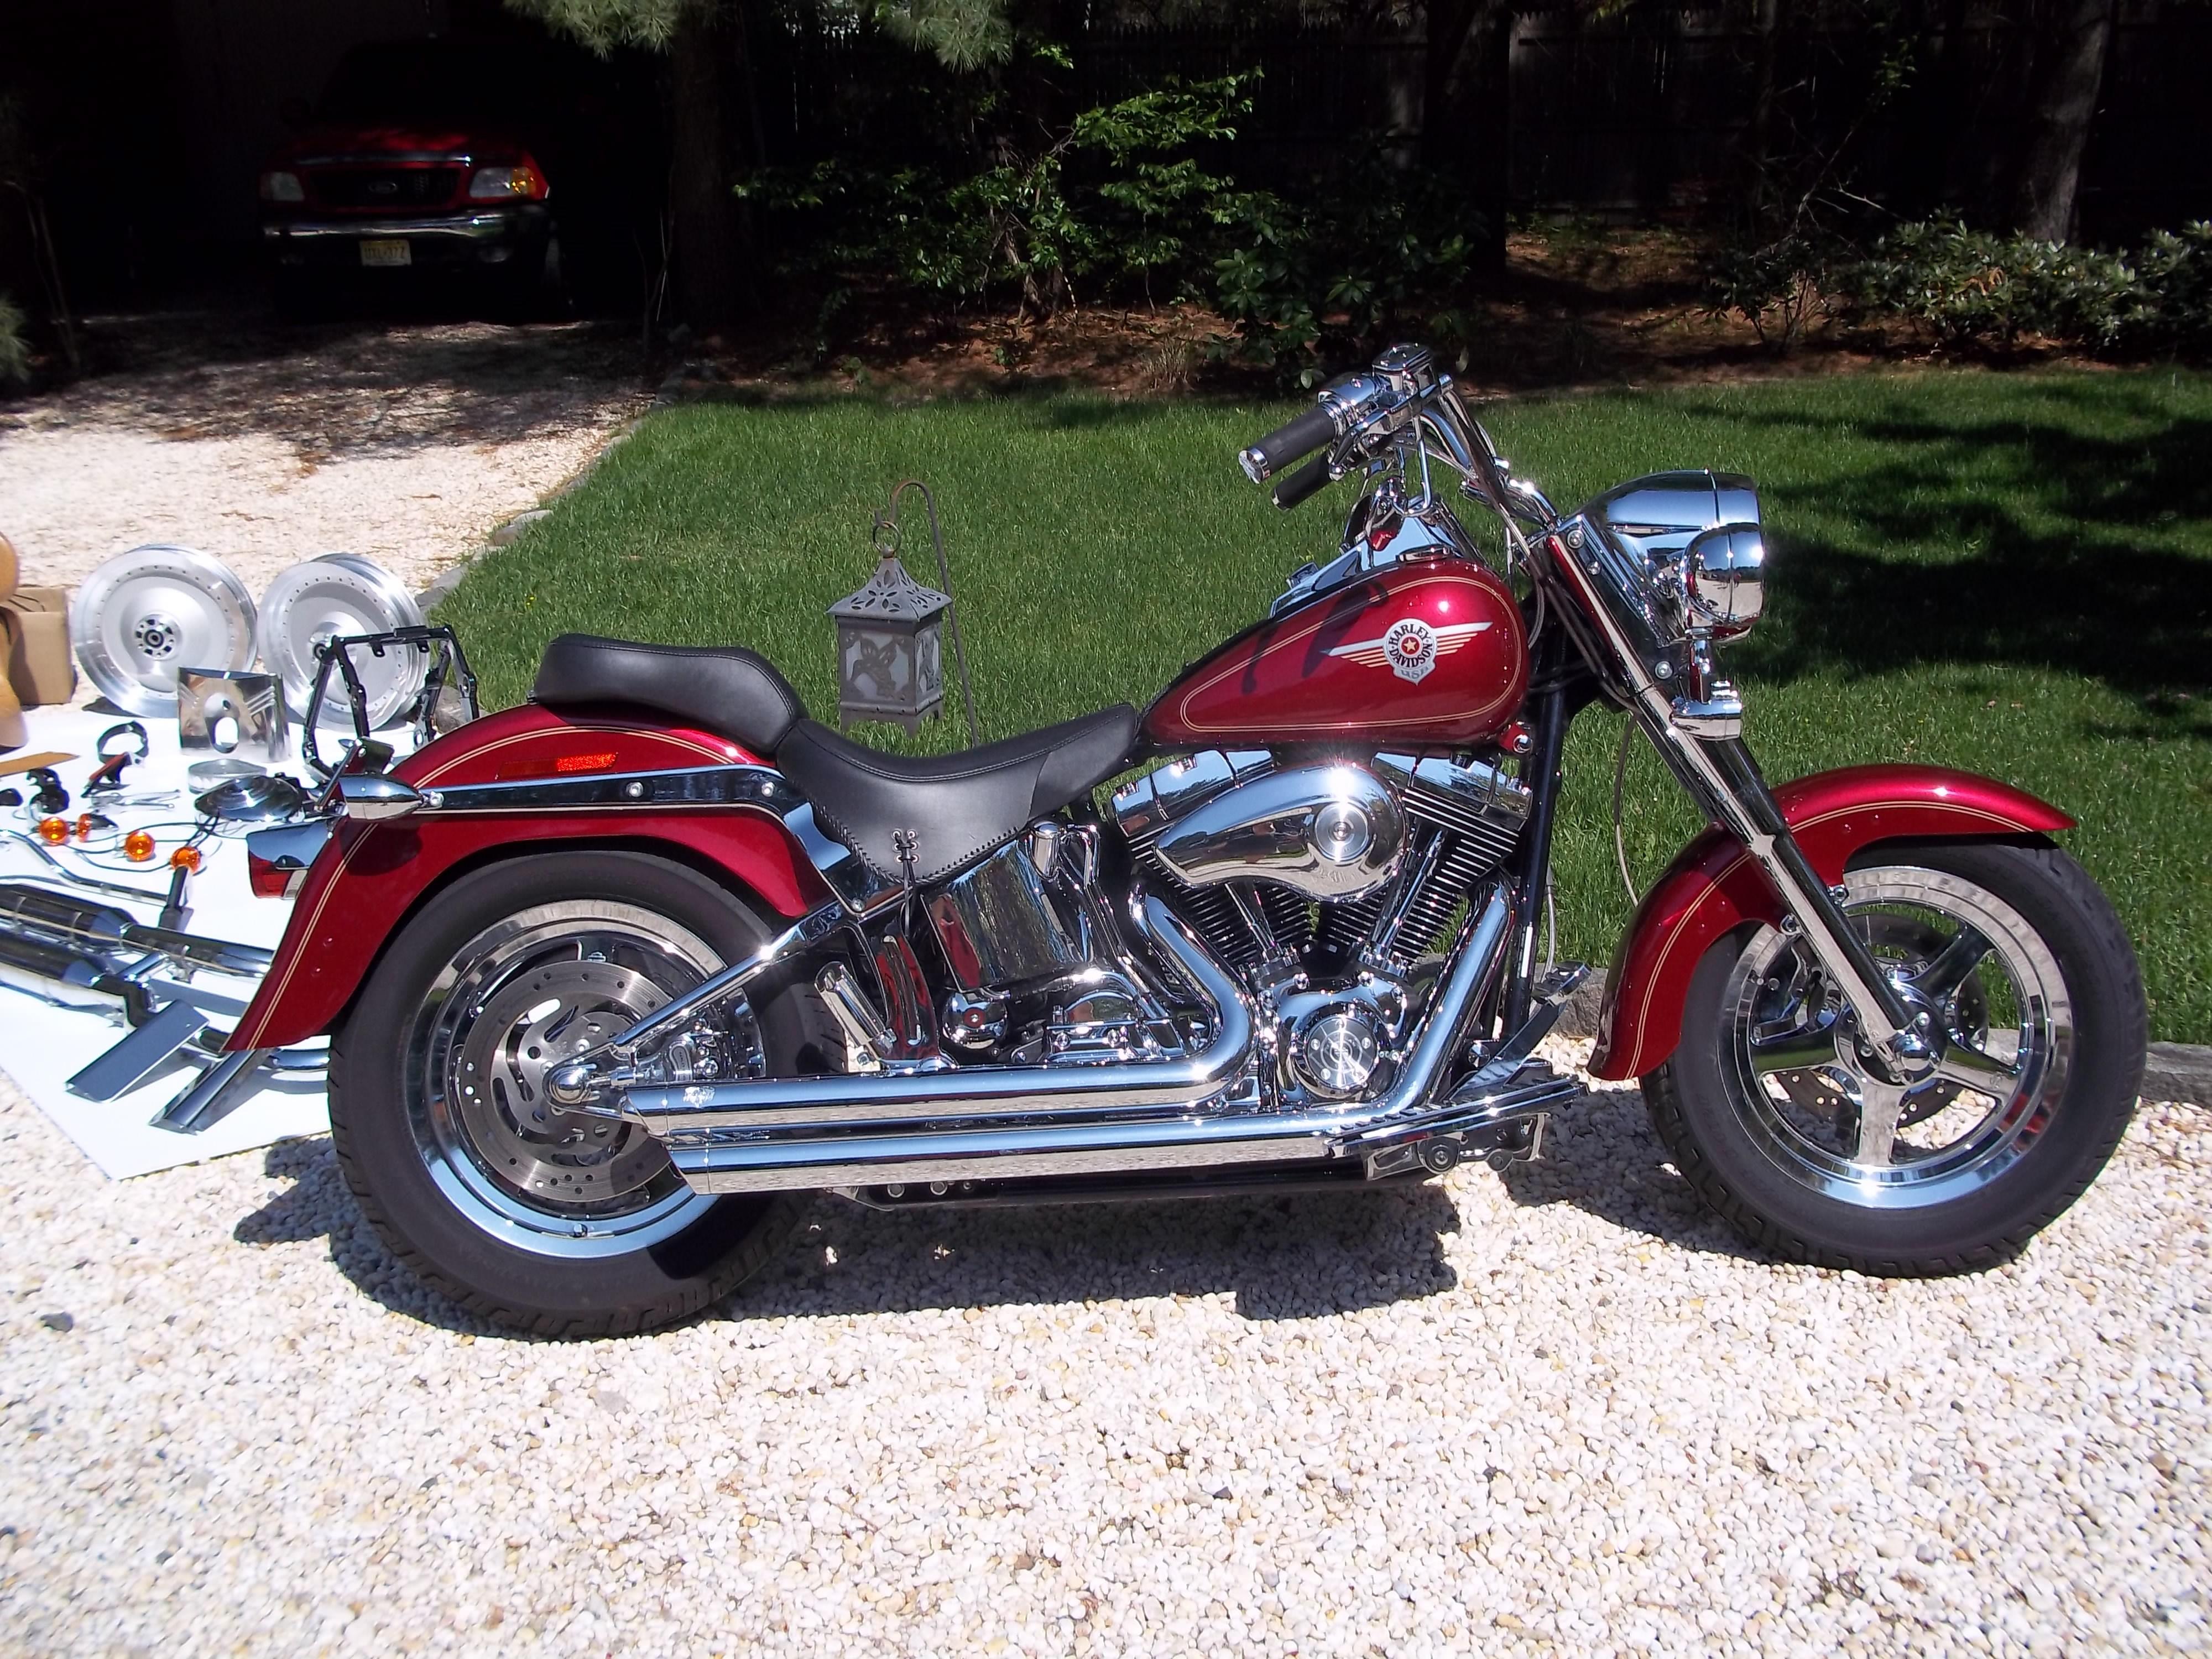 Harley davidson stock options